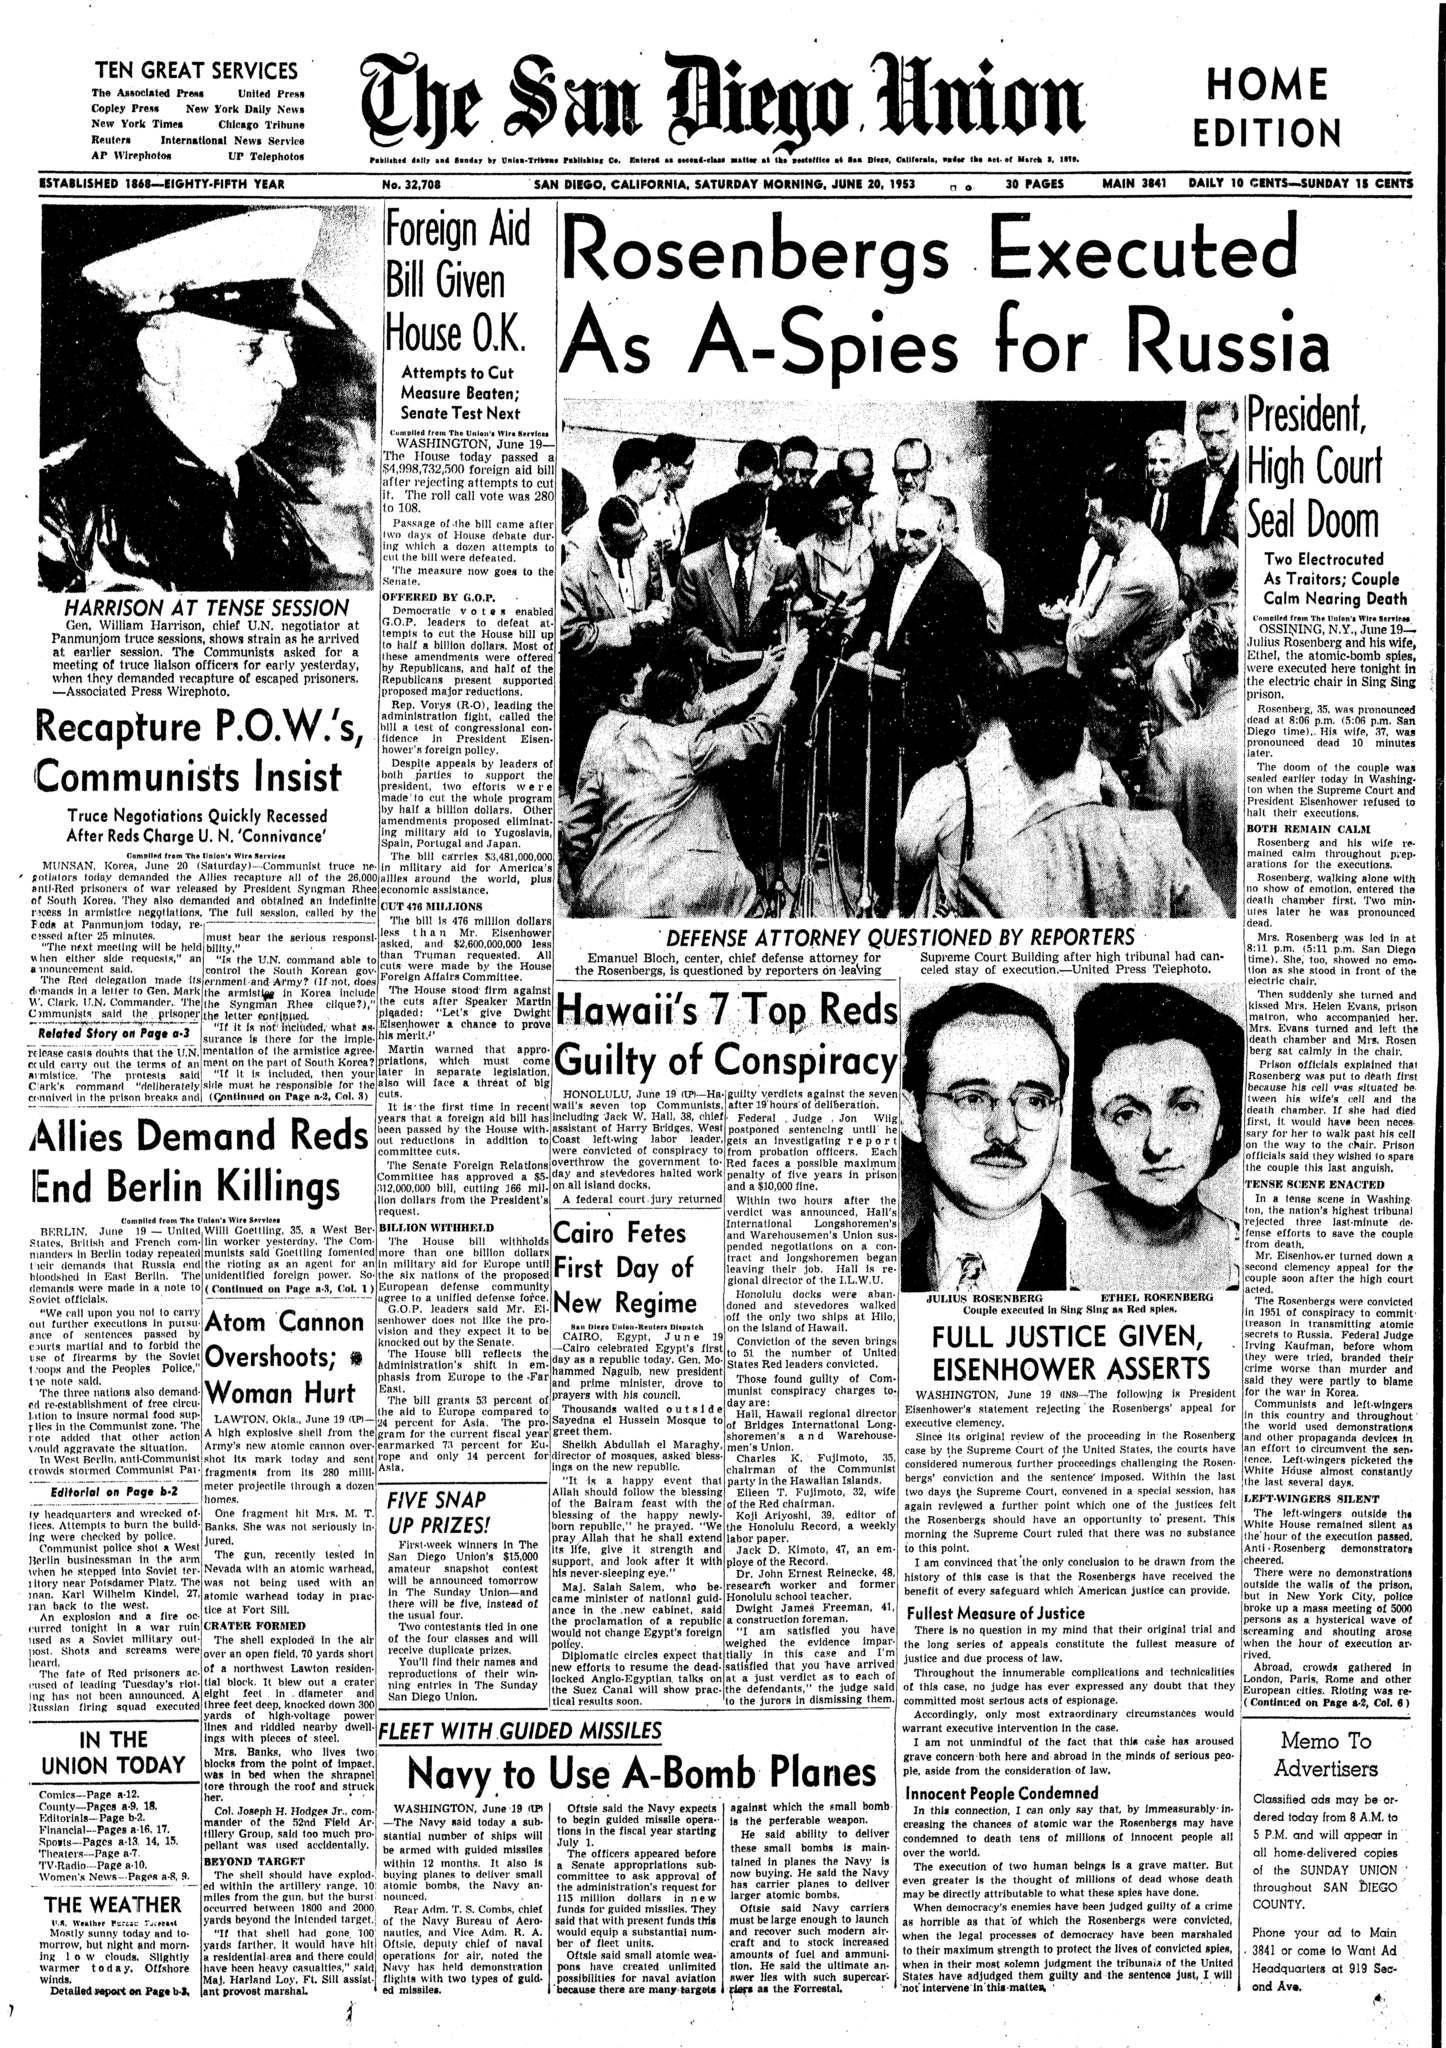 June 20, 1953